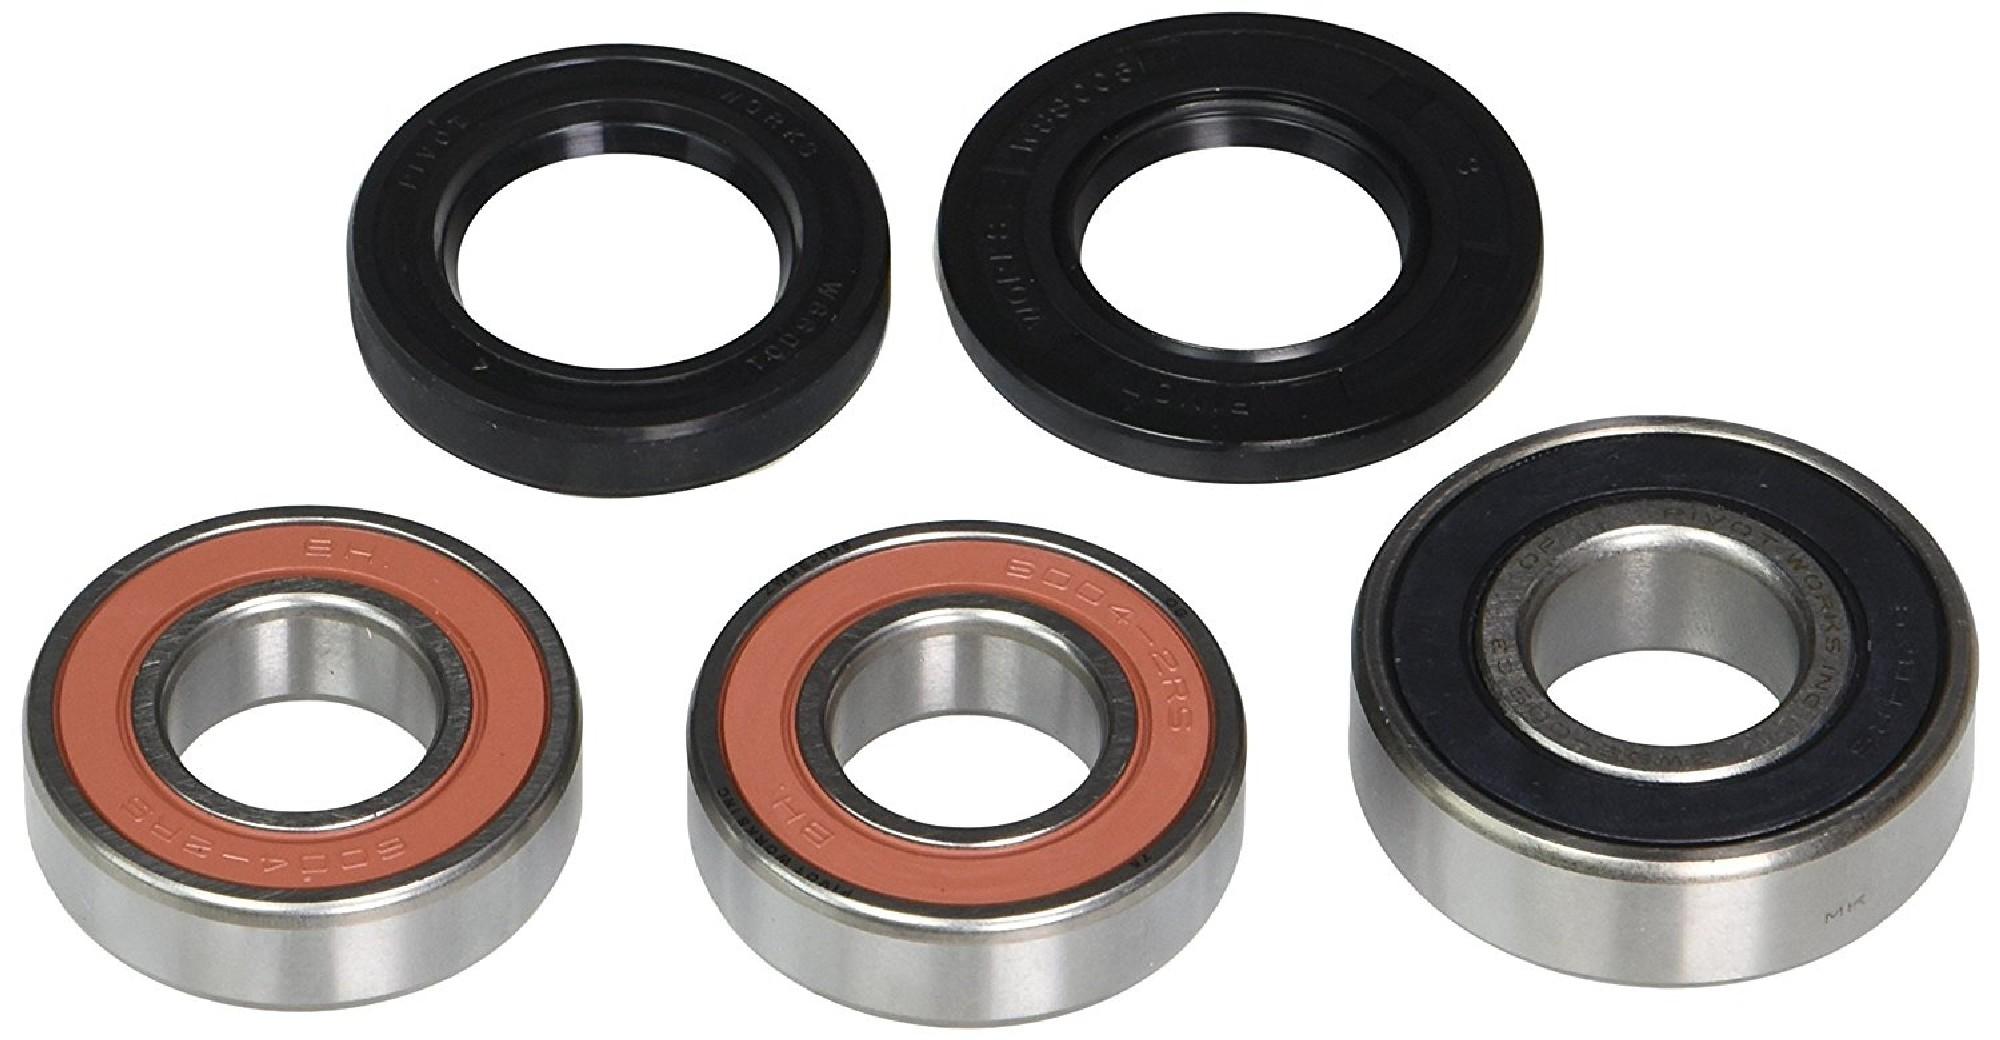 New Pivot Works Wheel Bearing Kit PWRWS-K20-000 For Kawasaki ZX 6R 2007-2008